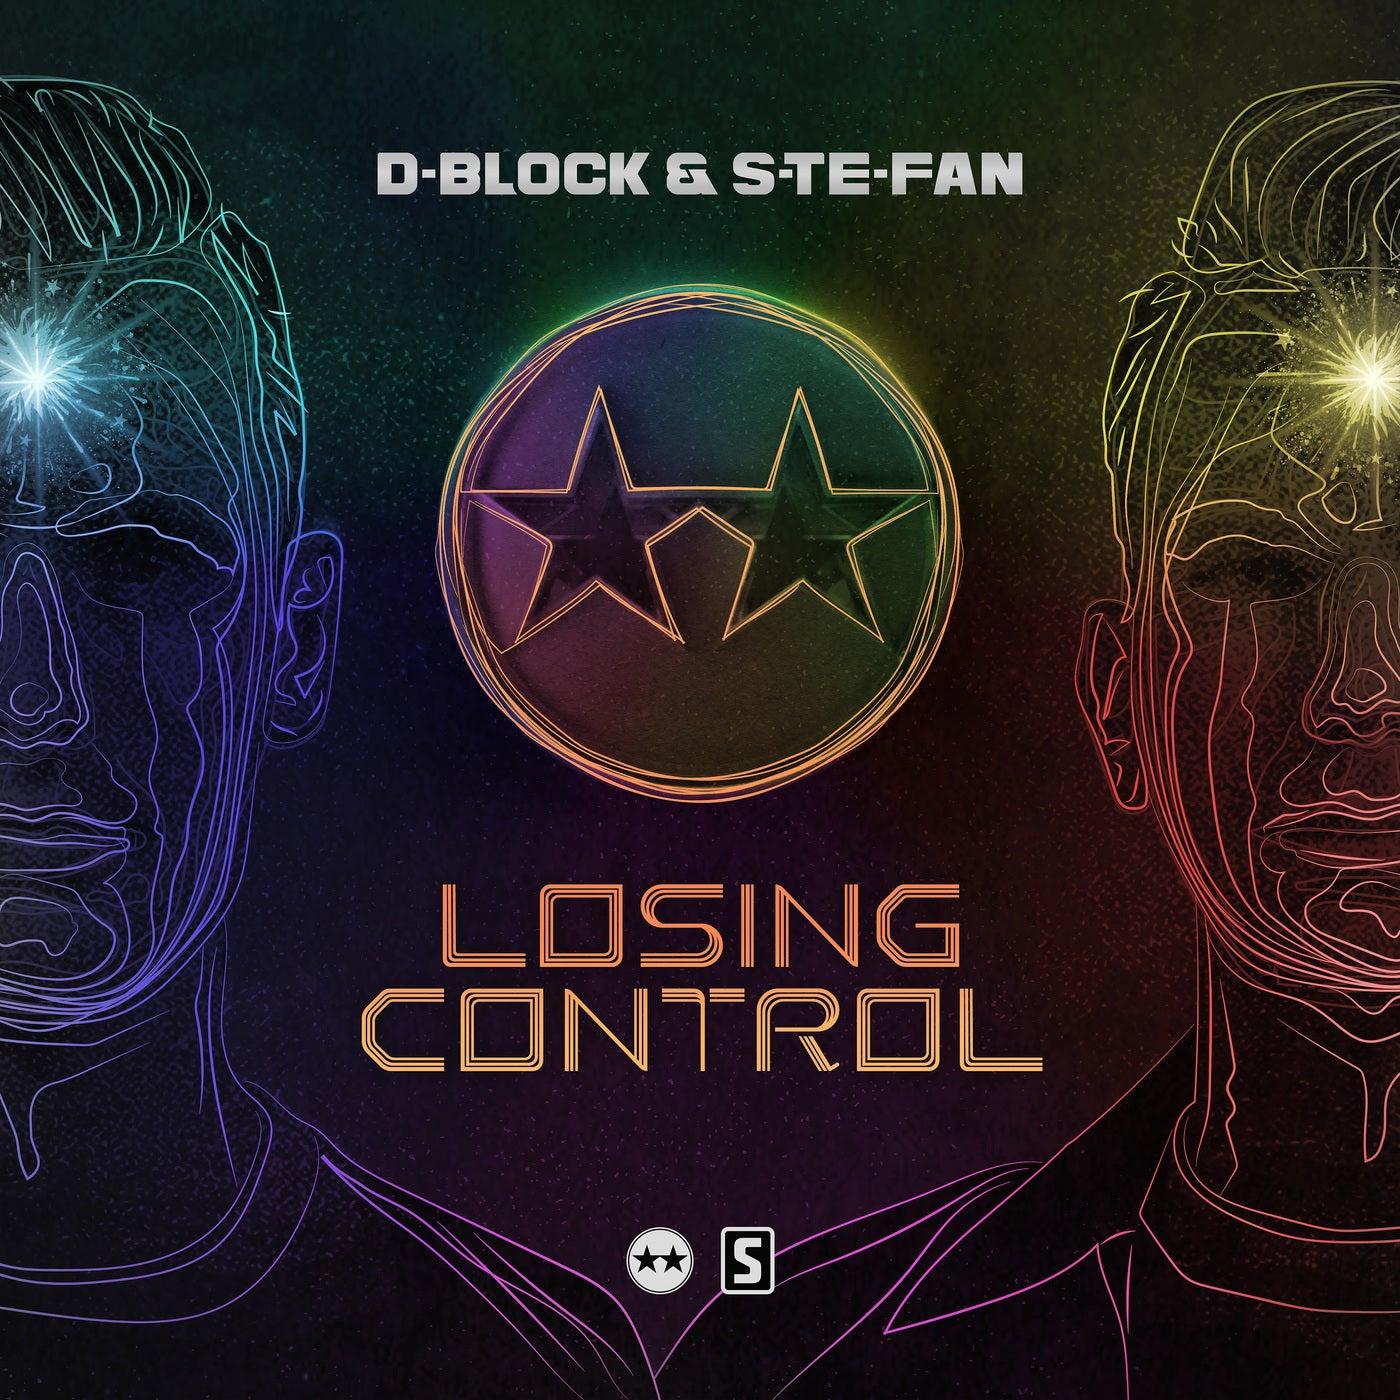 Losing Control (Original Mix)